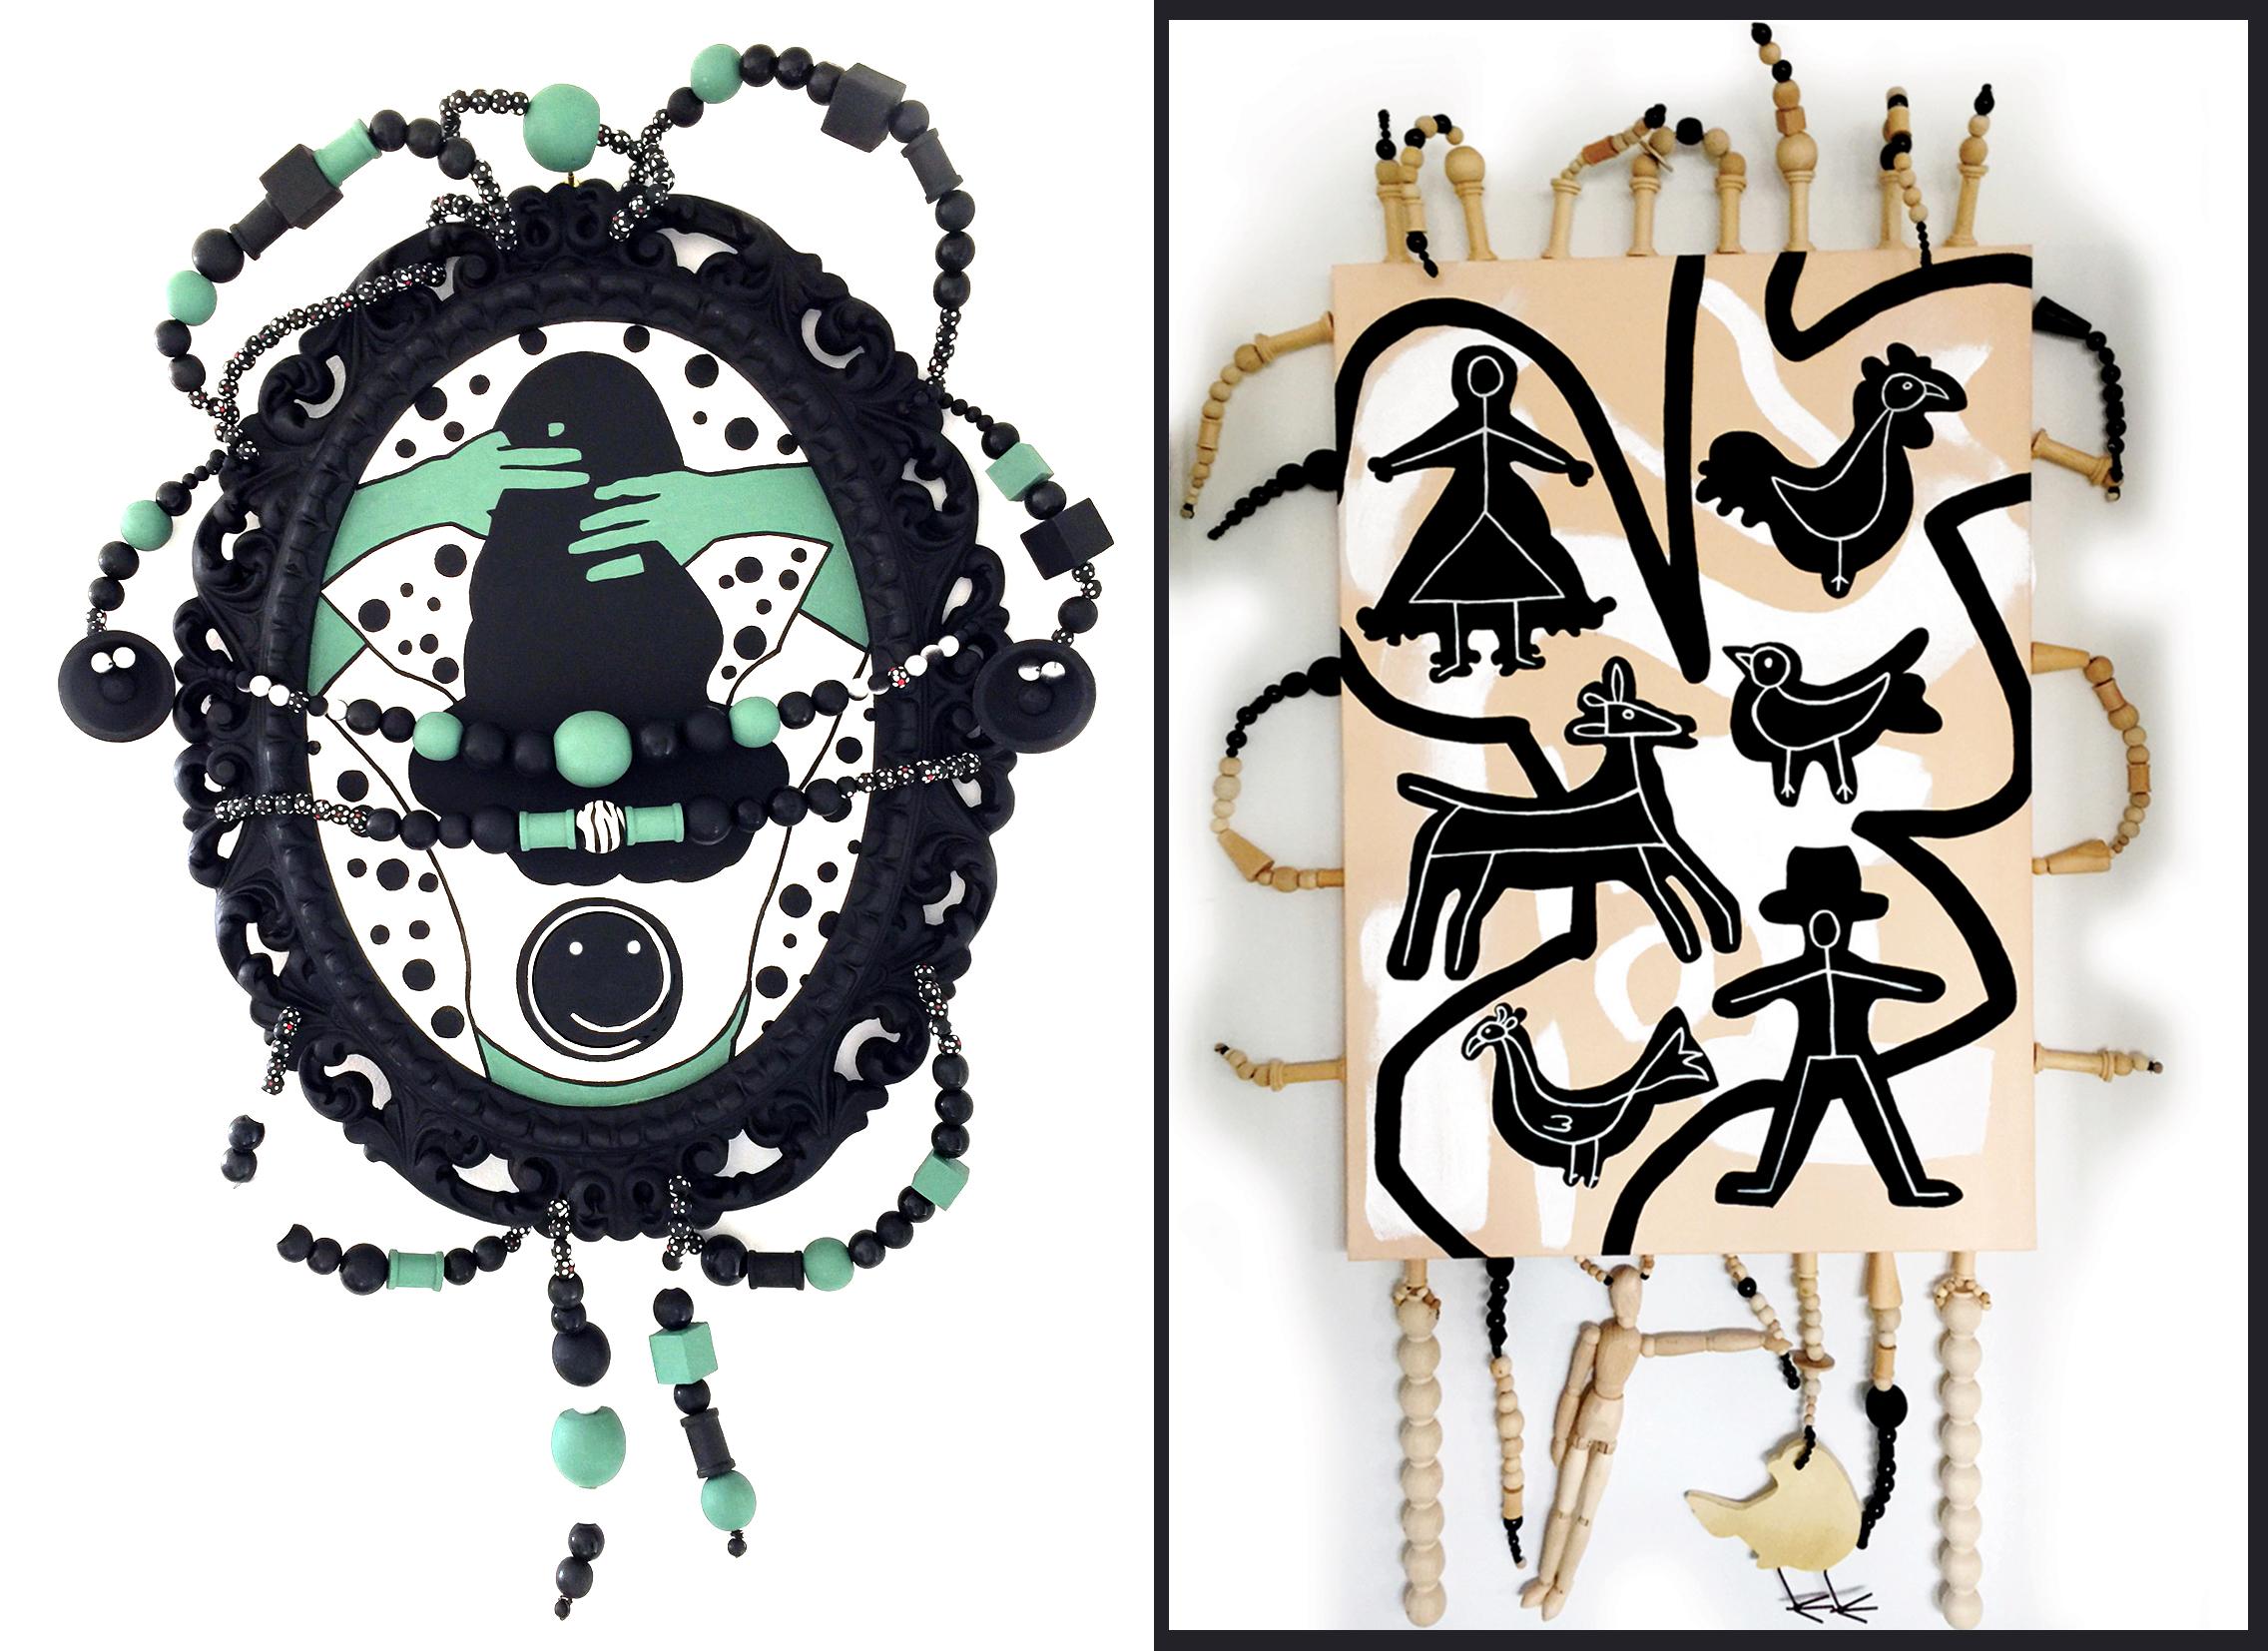 "Acrylic on canvas, wood frame, beads, PORTRAIT, 28"" x 20""x 2""                   Acrylic on canvas, wood, beads, COOKIE CUTTERS, 60"" x 33"" x 2"""